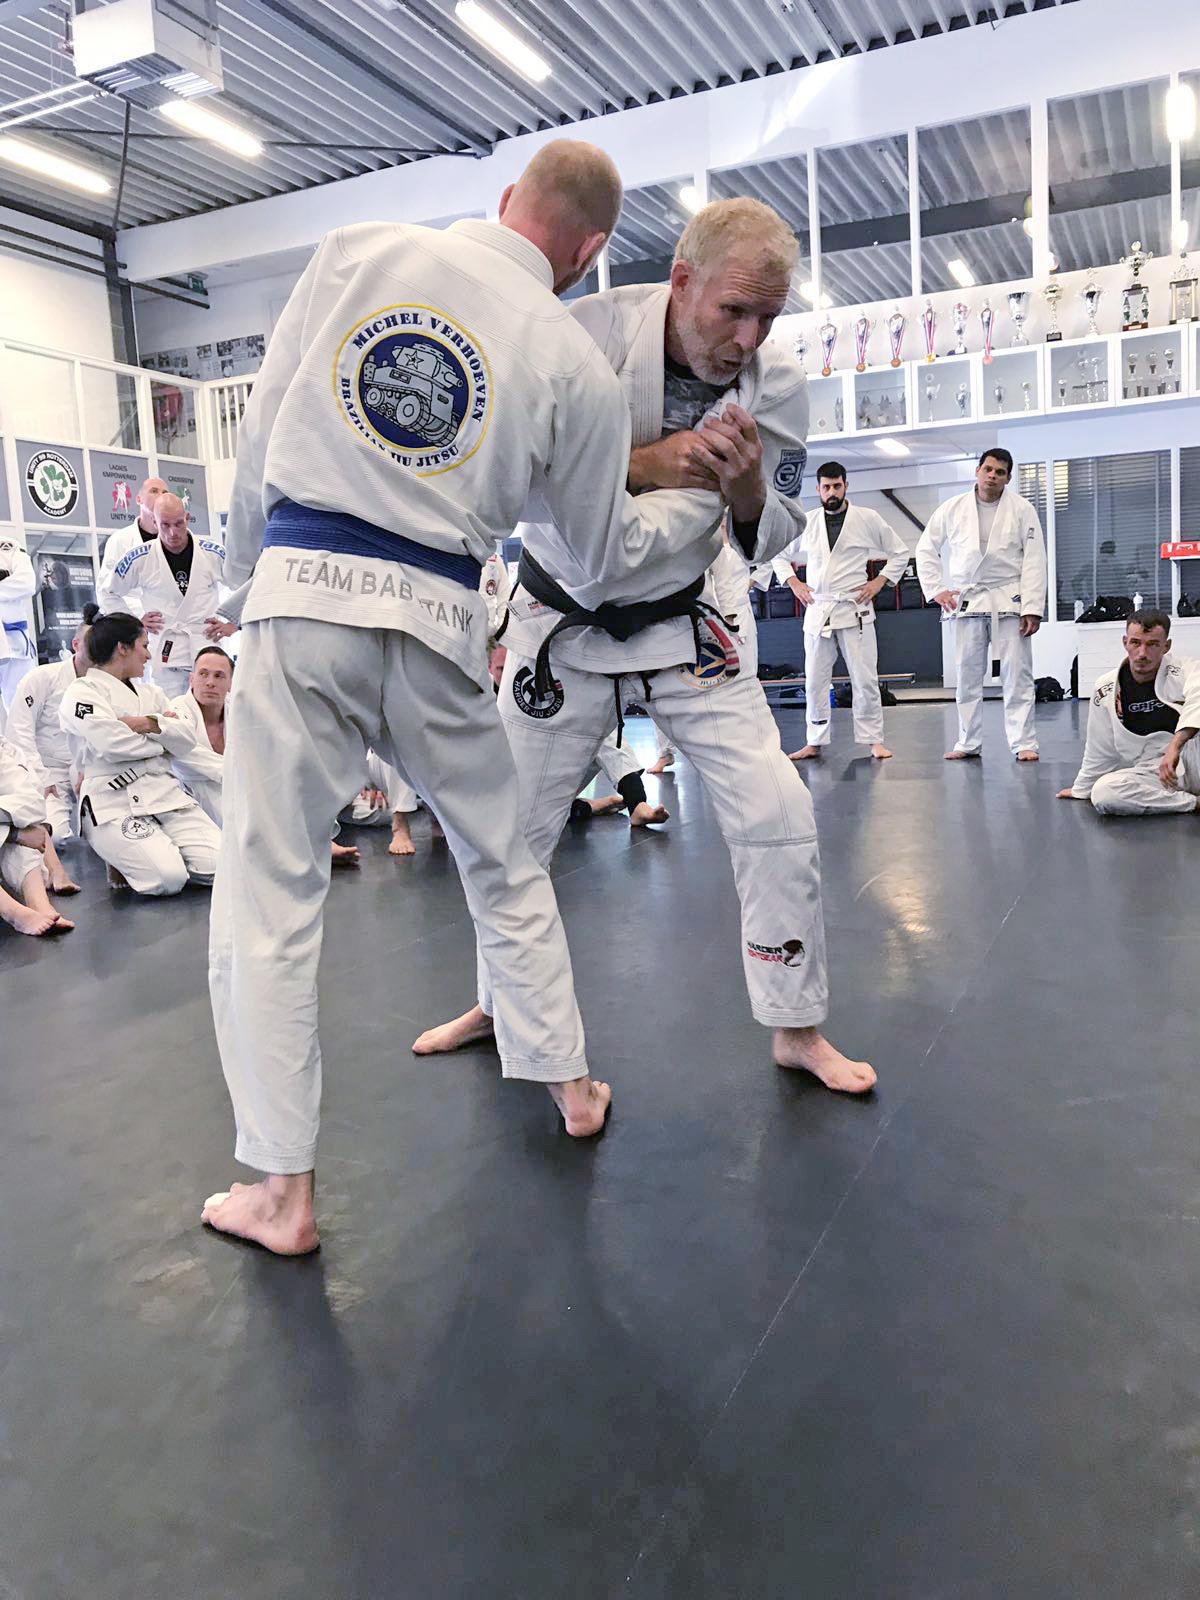 harold-harder_seminar_gracie-jiu-jitsu-gouda_bjj-braziliaans-jiu-jitsu-zelfverdediging_selfdefense-5